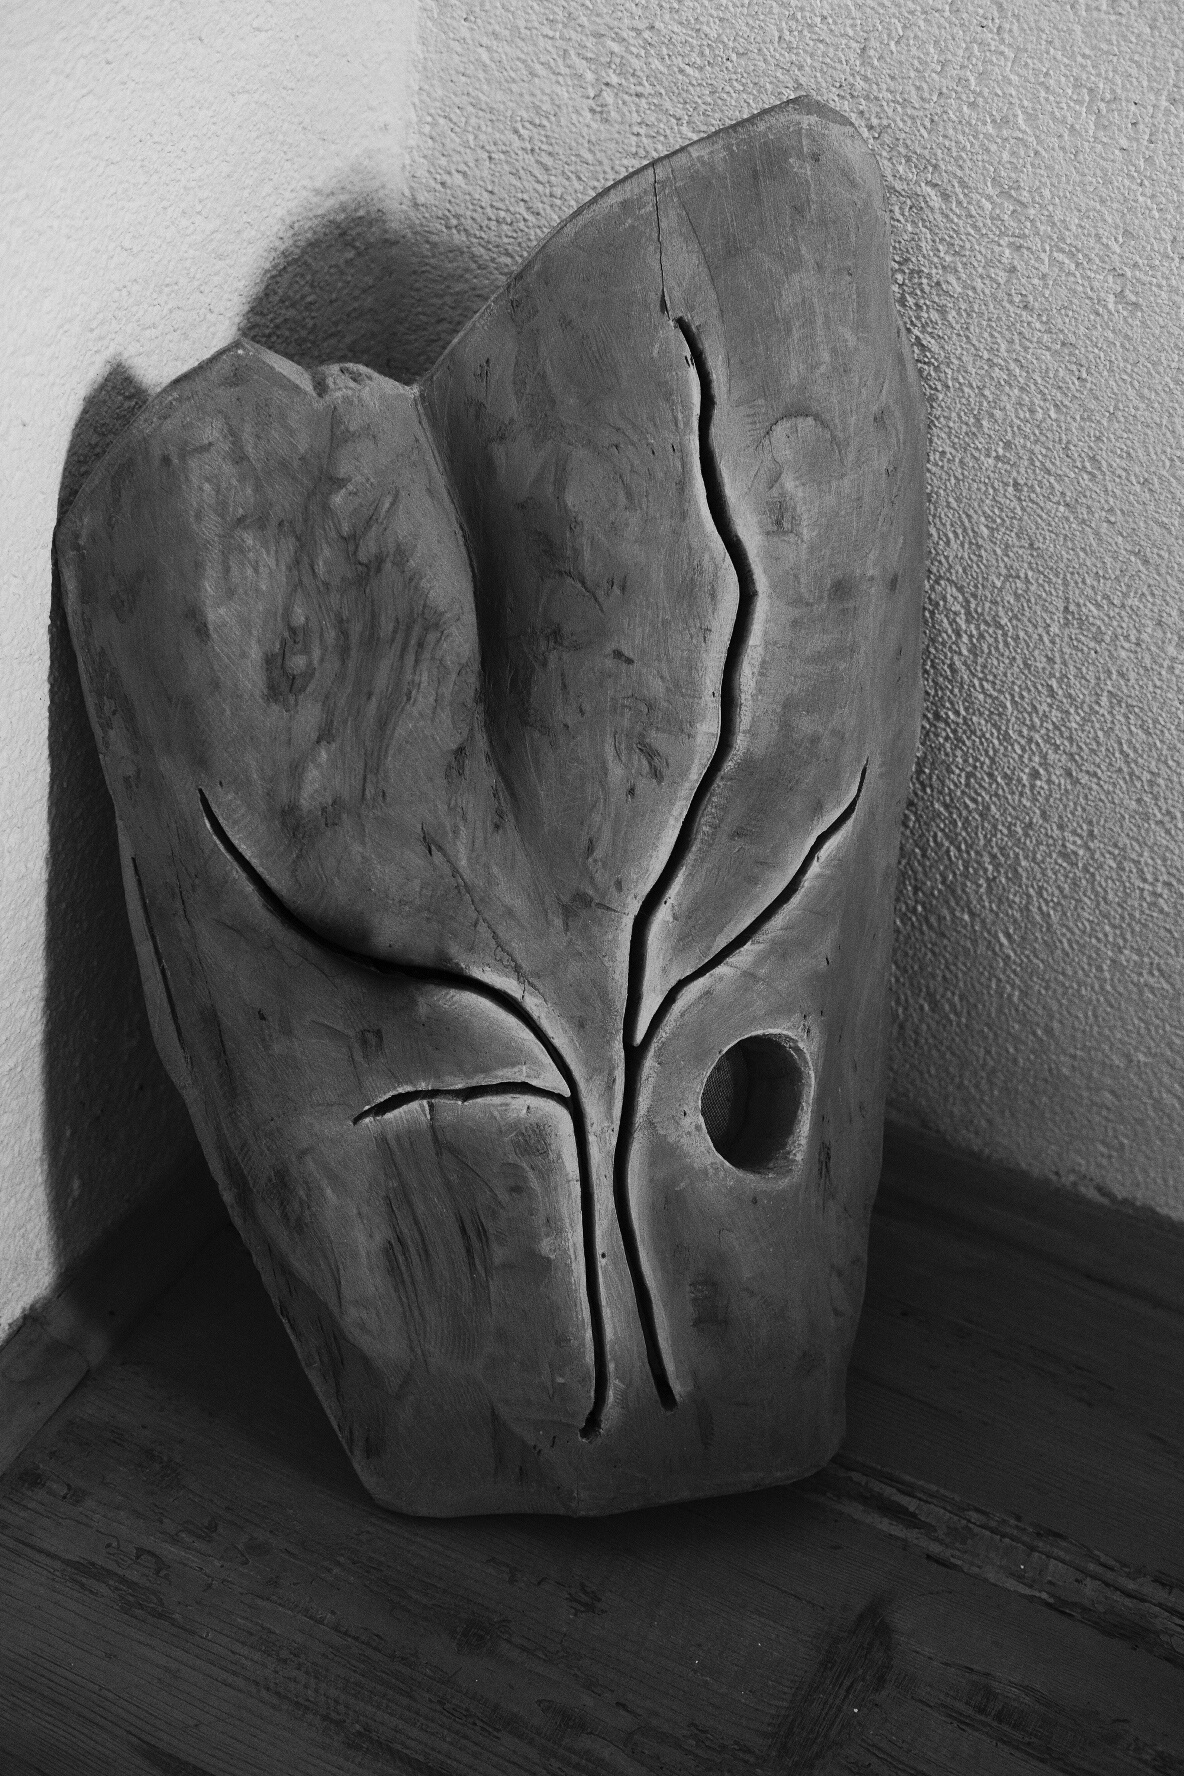 The Mask by Goran Jorganovich